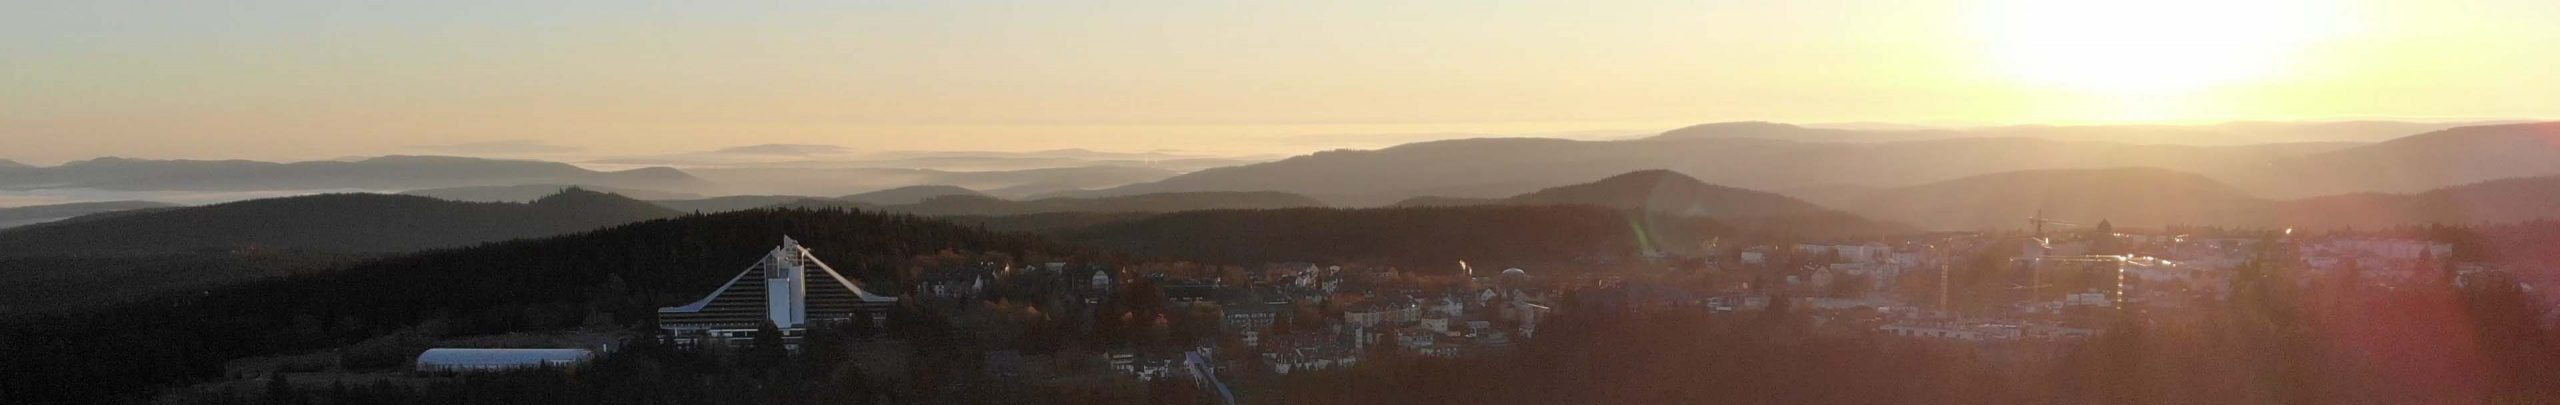 Oberhof Drohne Sonnenaufgang